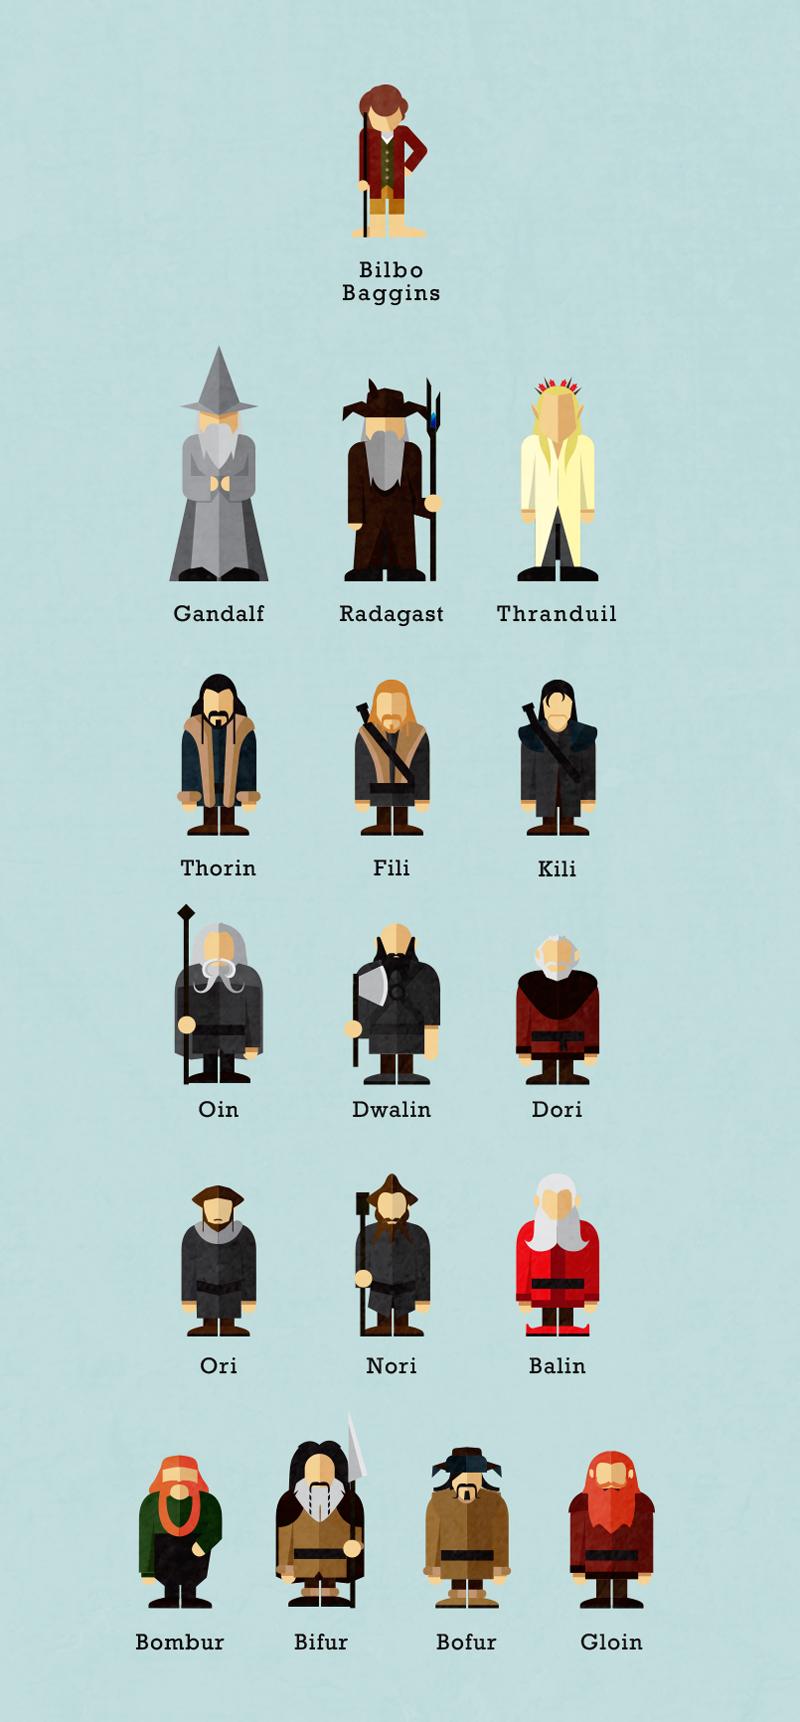 hobbit smaug tukitoku LOTR infographics elves dwarves tetuko Desolation Of Smaug gandalf